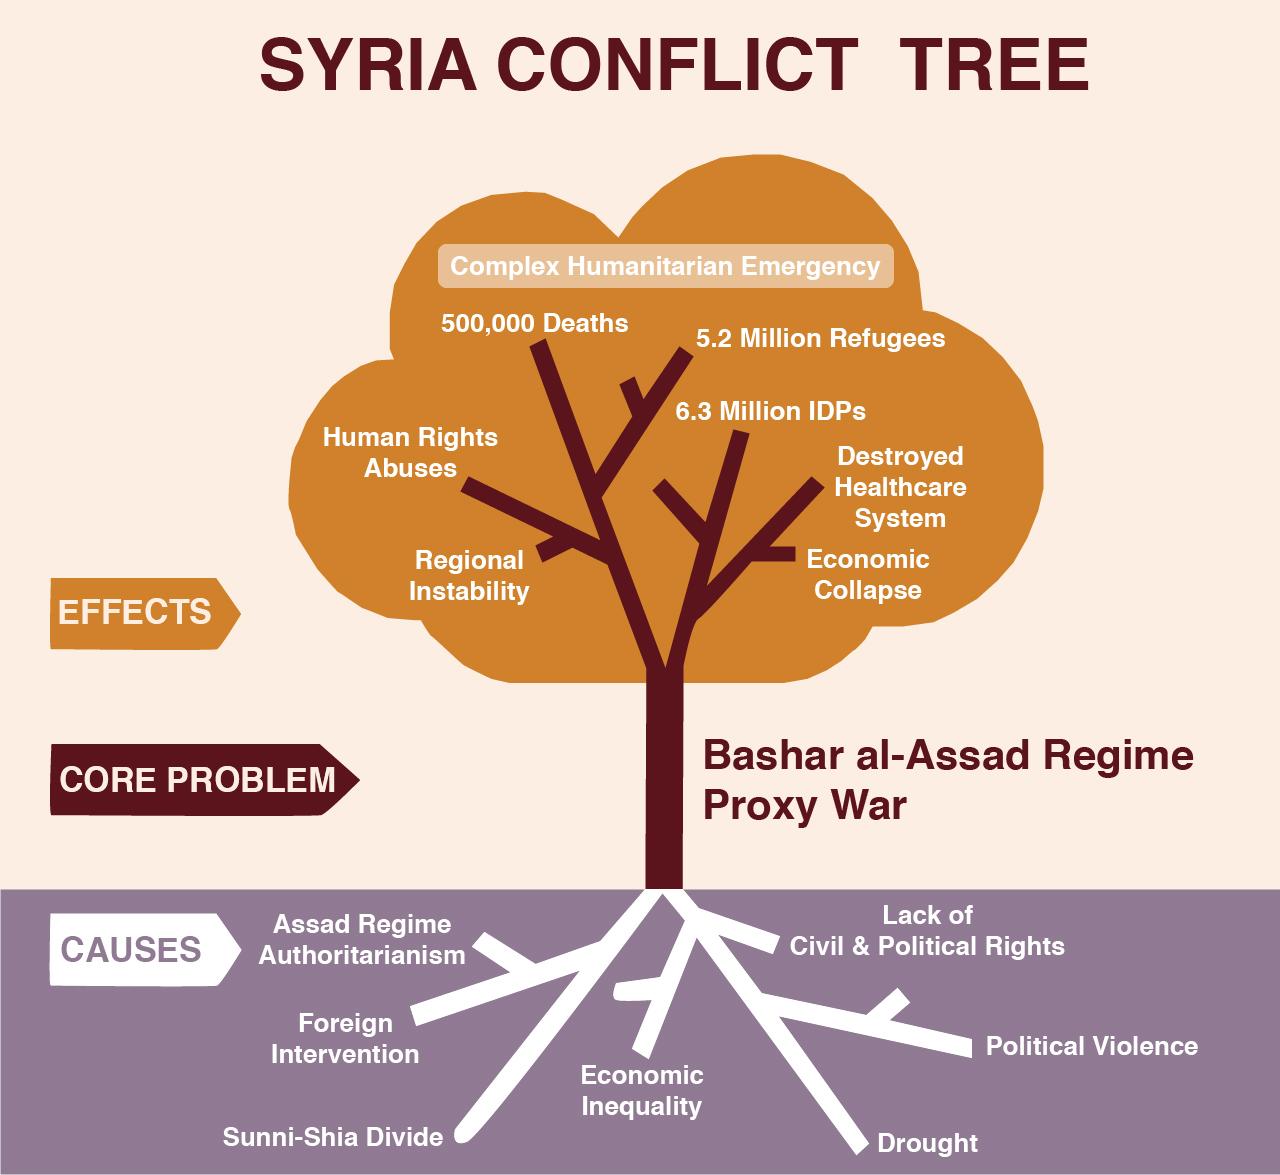 SyriaConflictTree.jpg